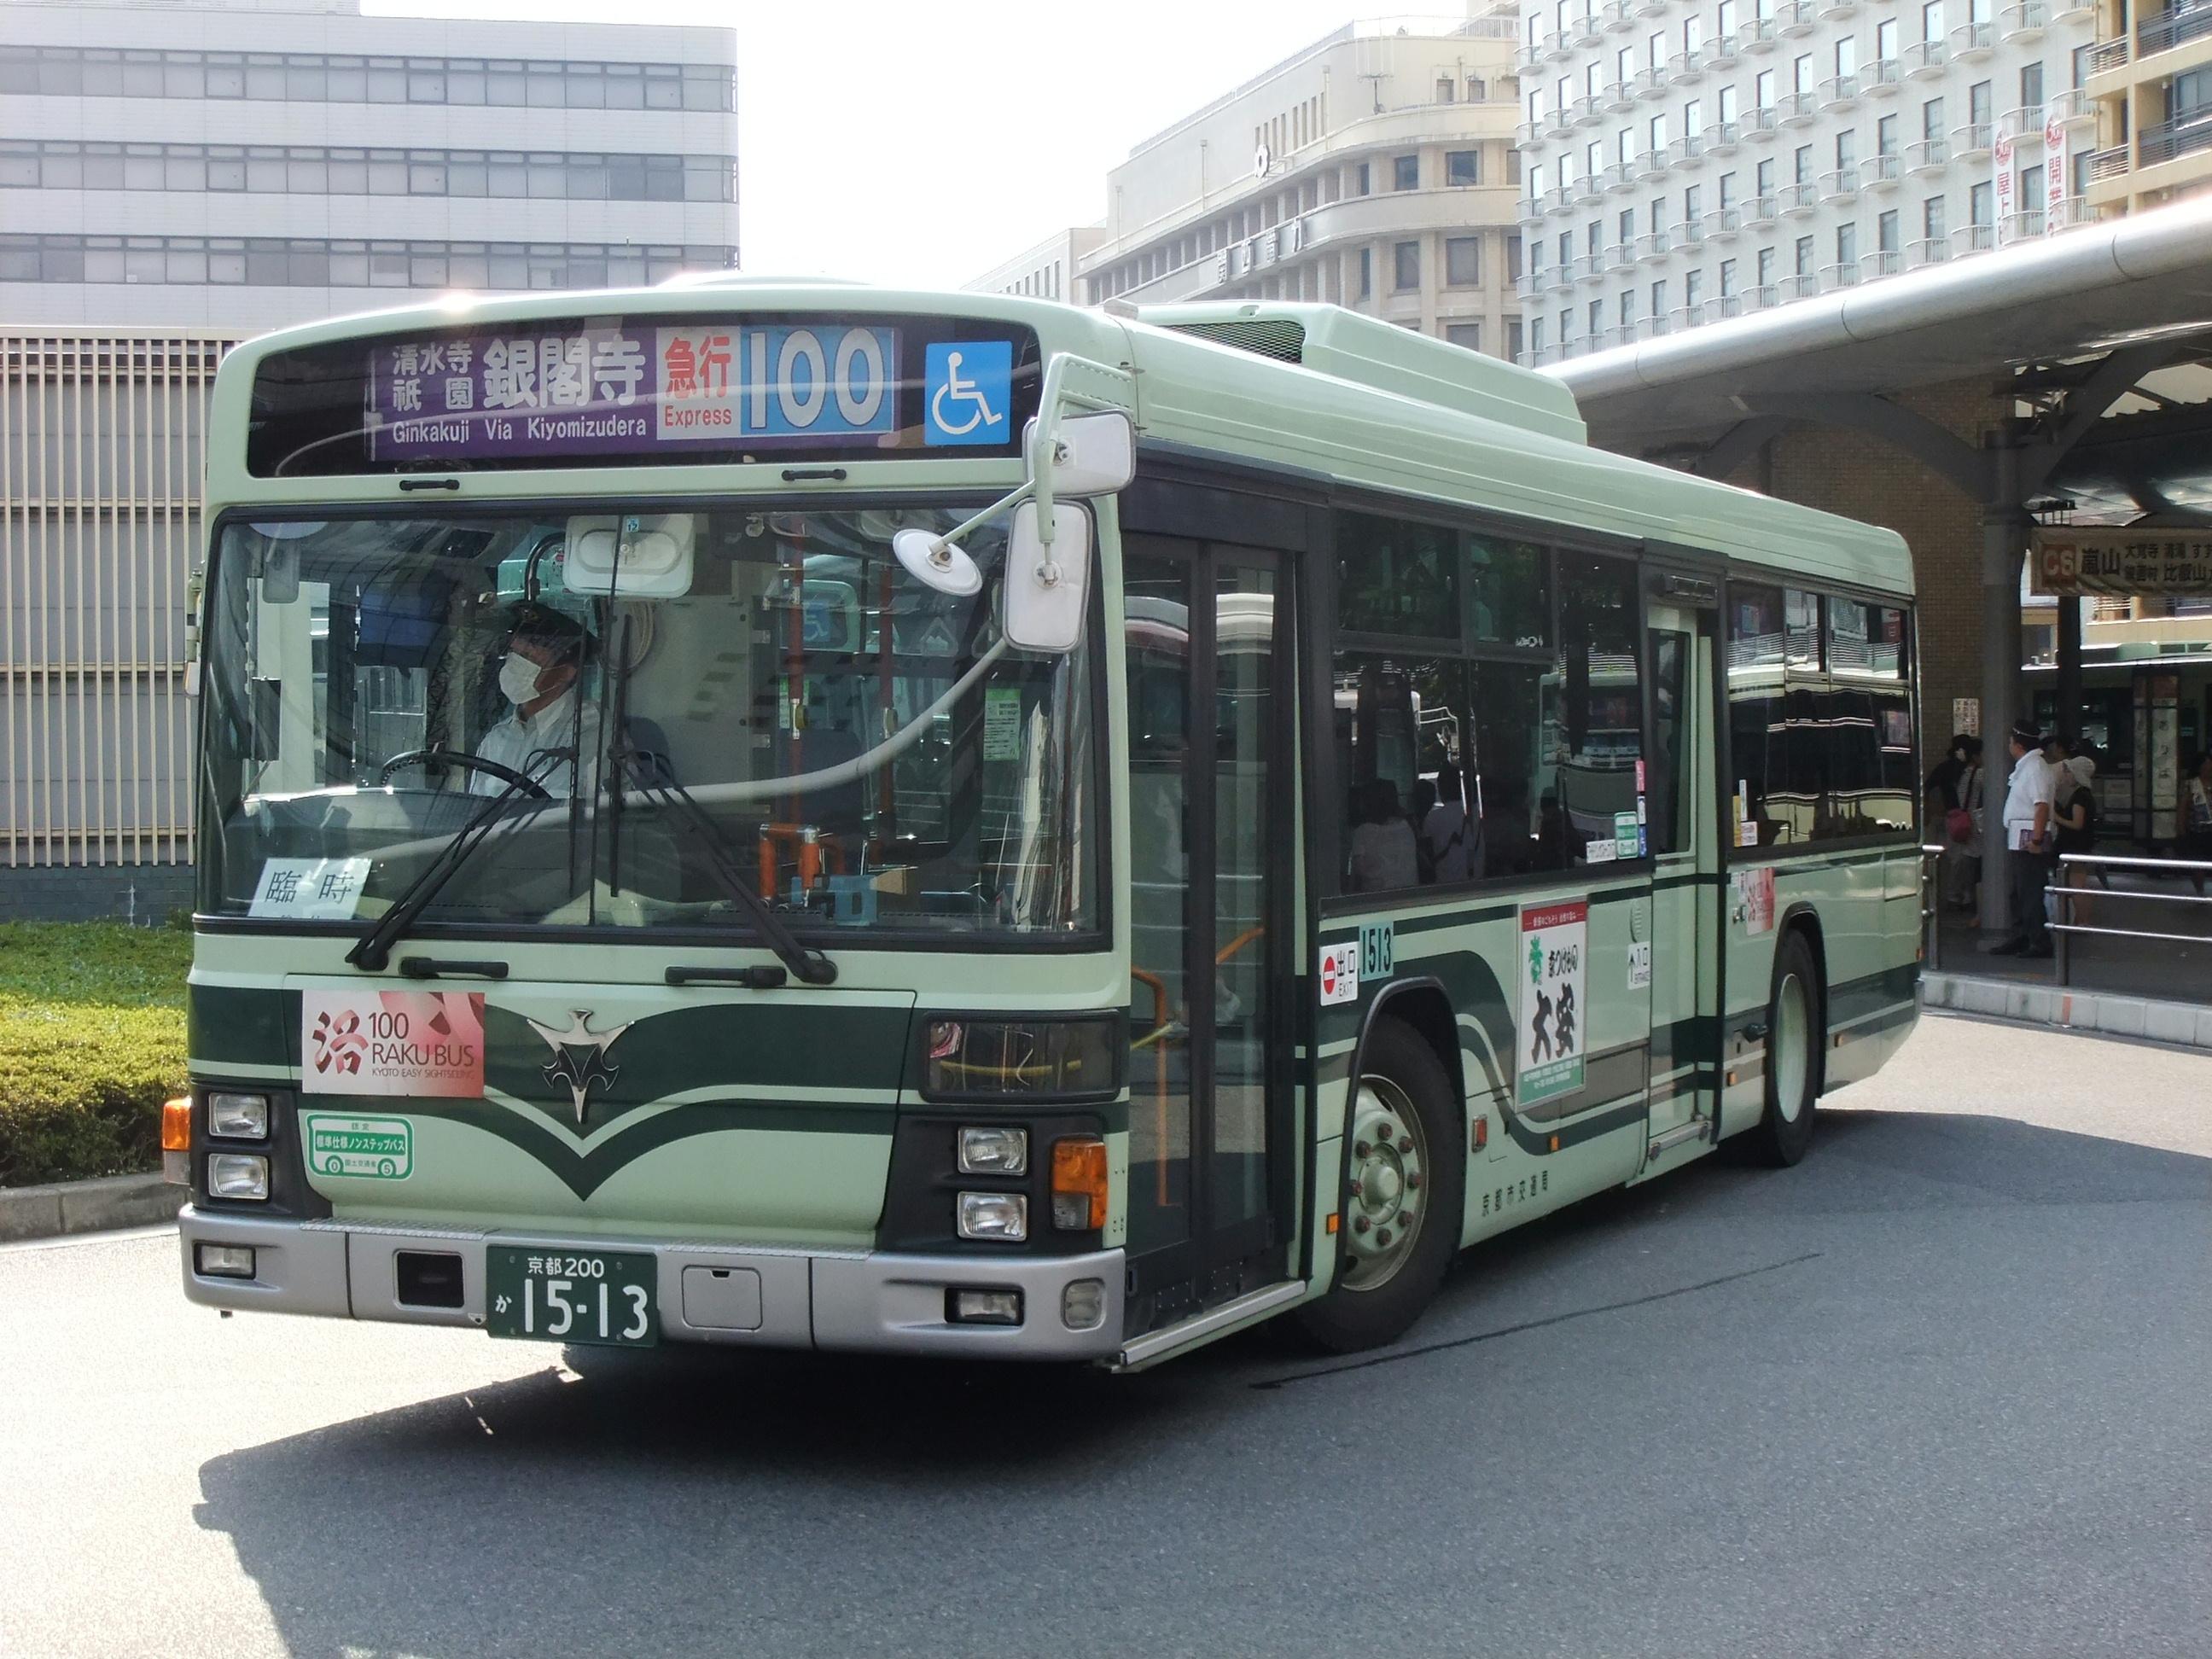 ISUZU ERGA, Kyoto Municipal Bus (1513).jpg